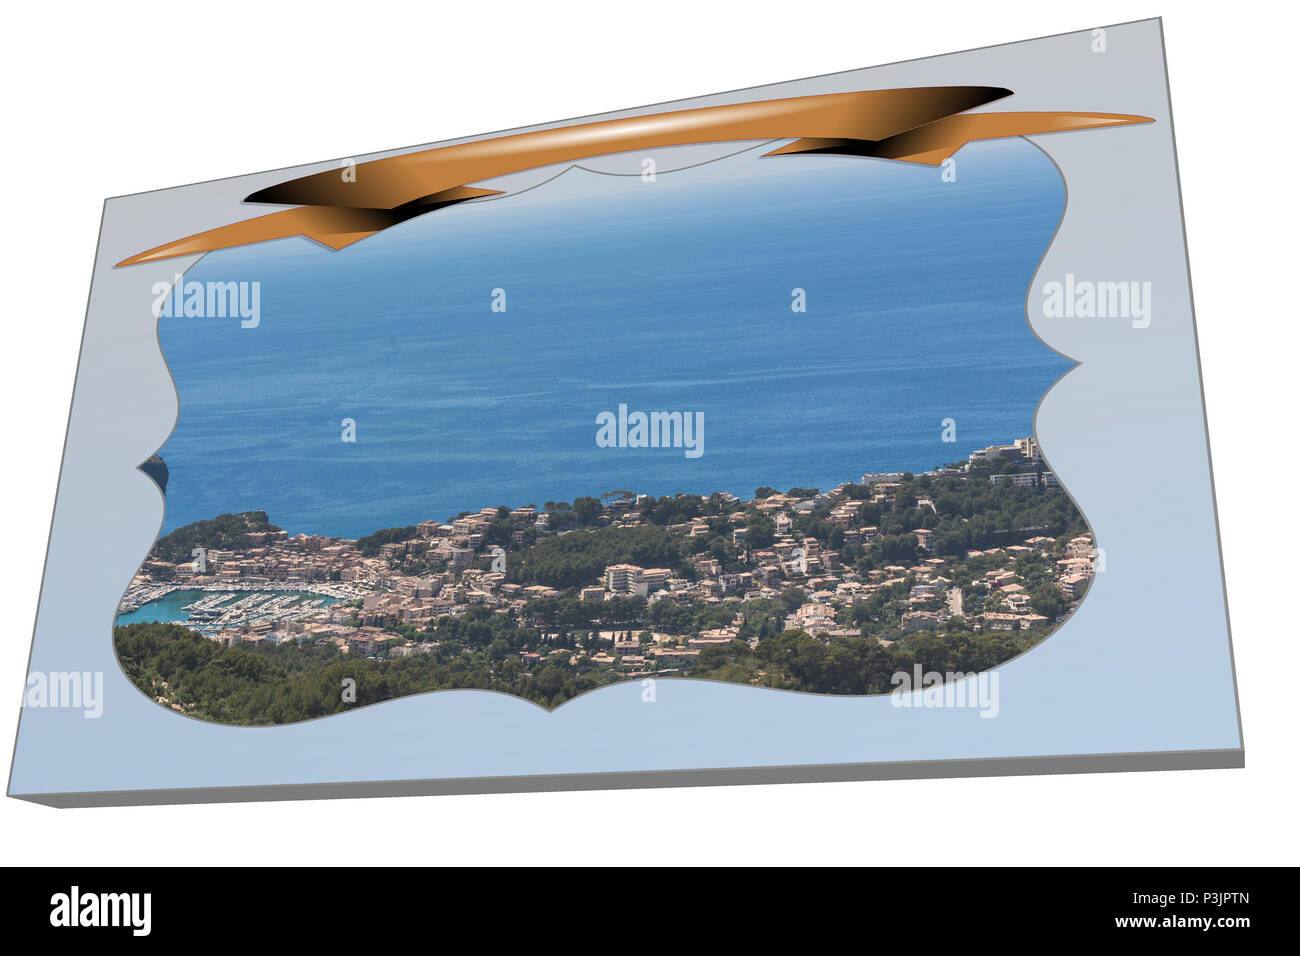 Postcard in 3D from Puerto de Soller in the mountains of the Serra de Tramuntana - Stock Image